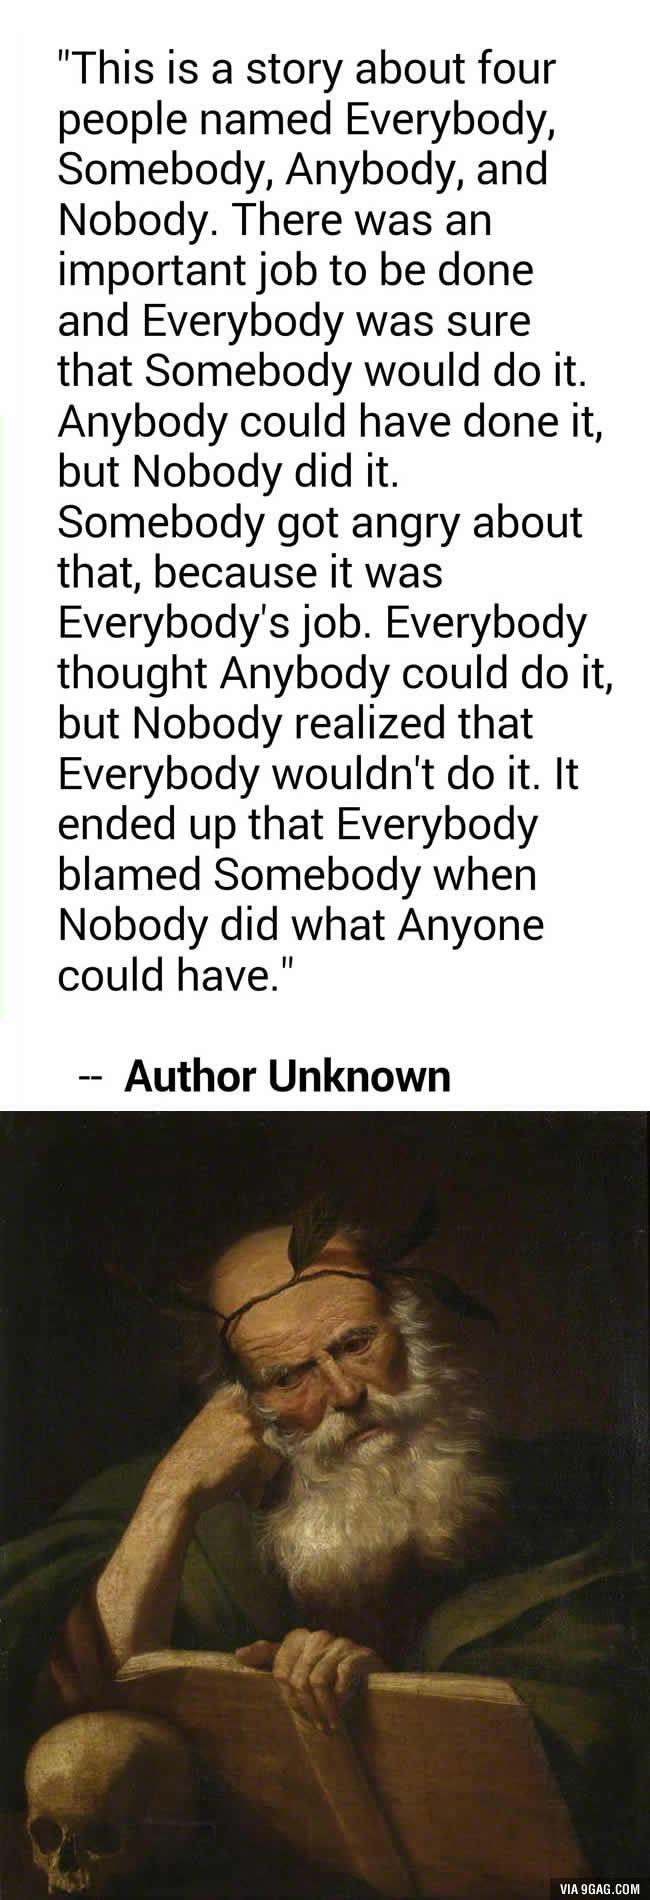 Very philosophical.